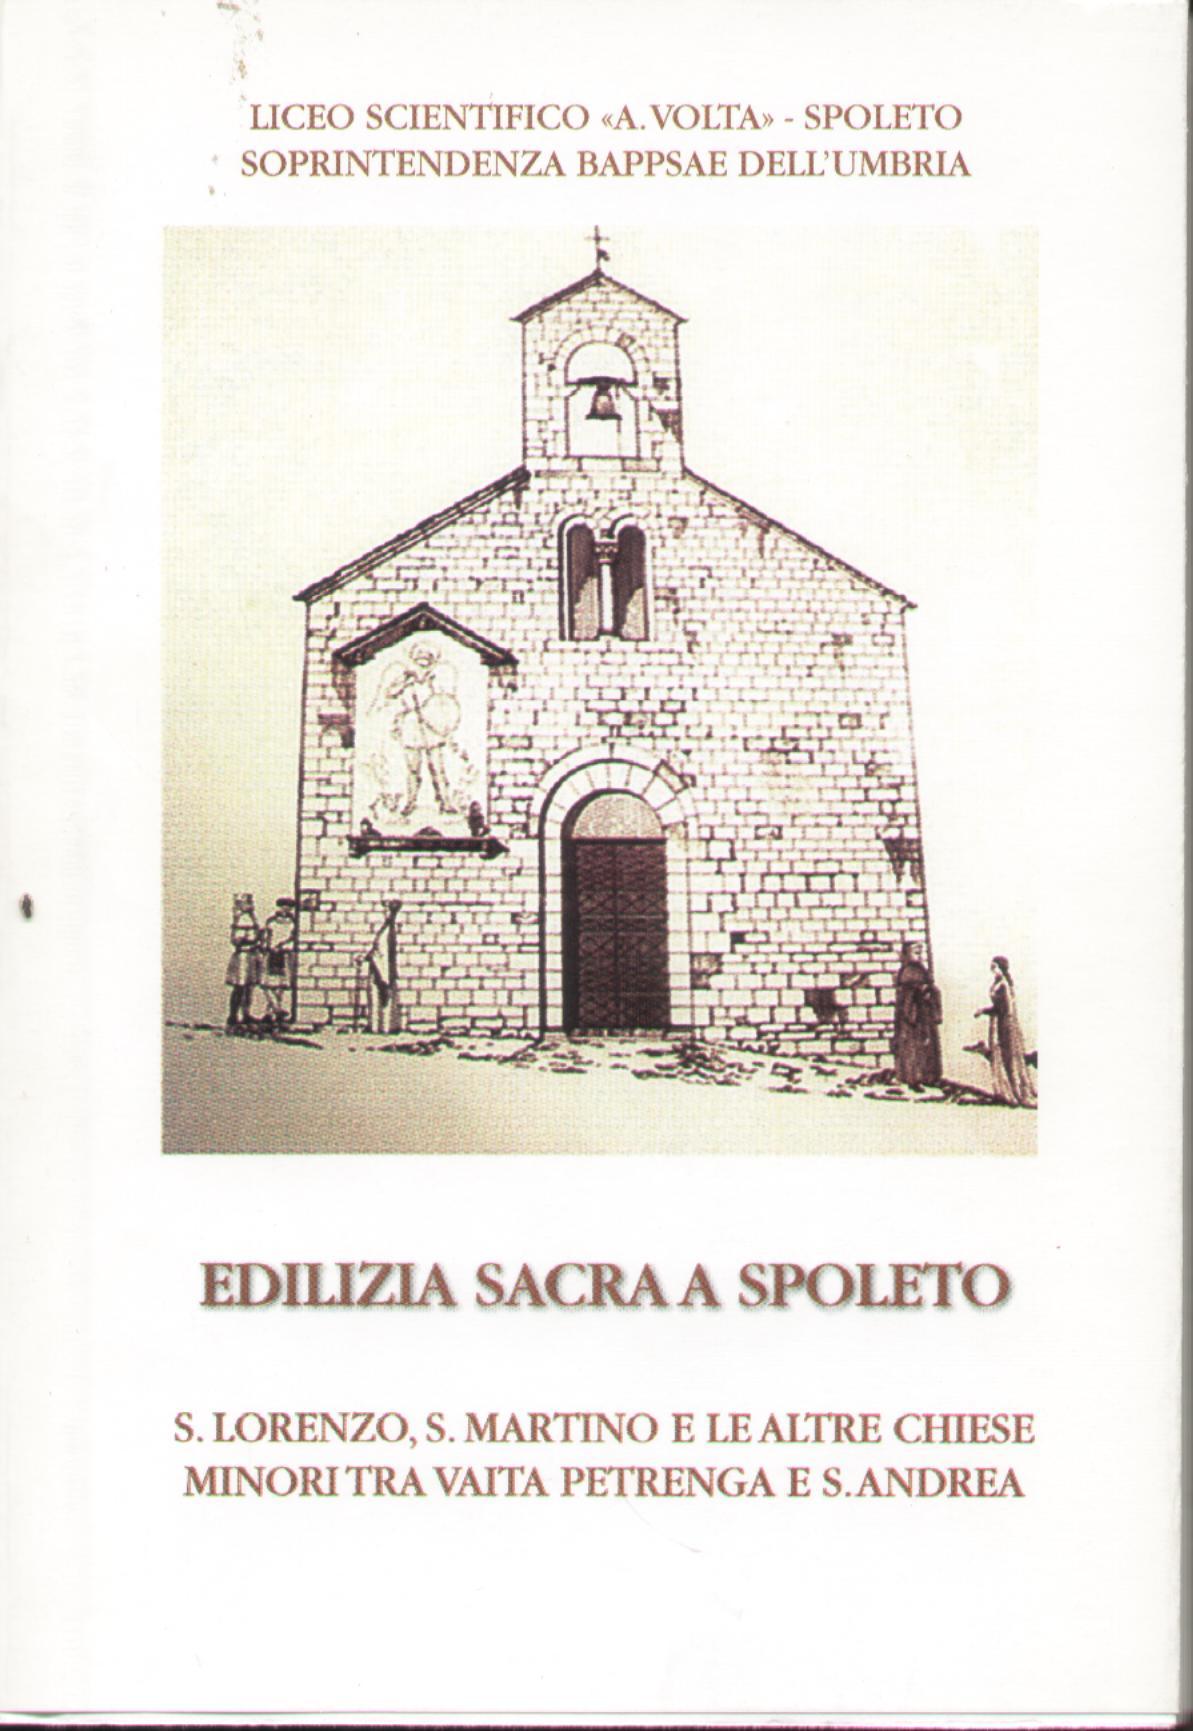 Edilizia sacra a Spoleto